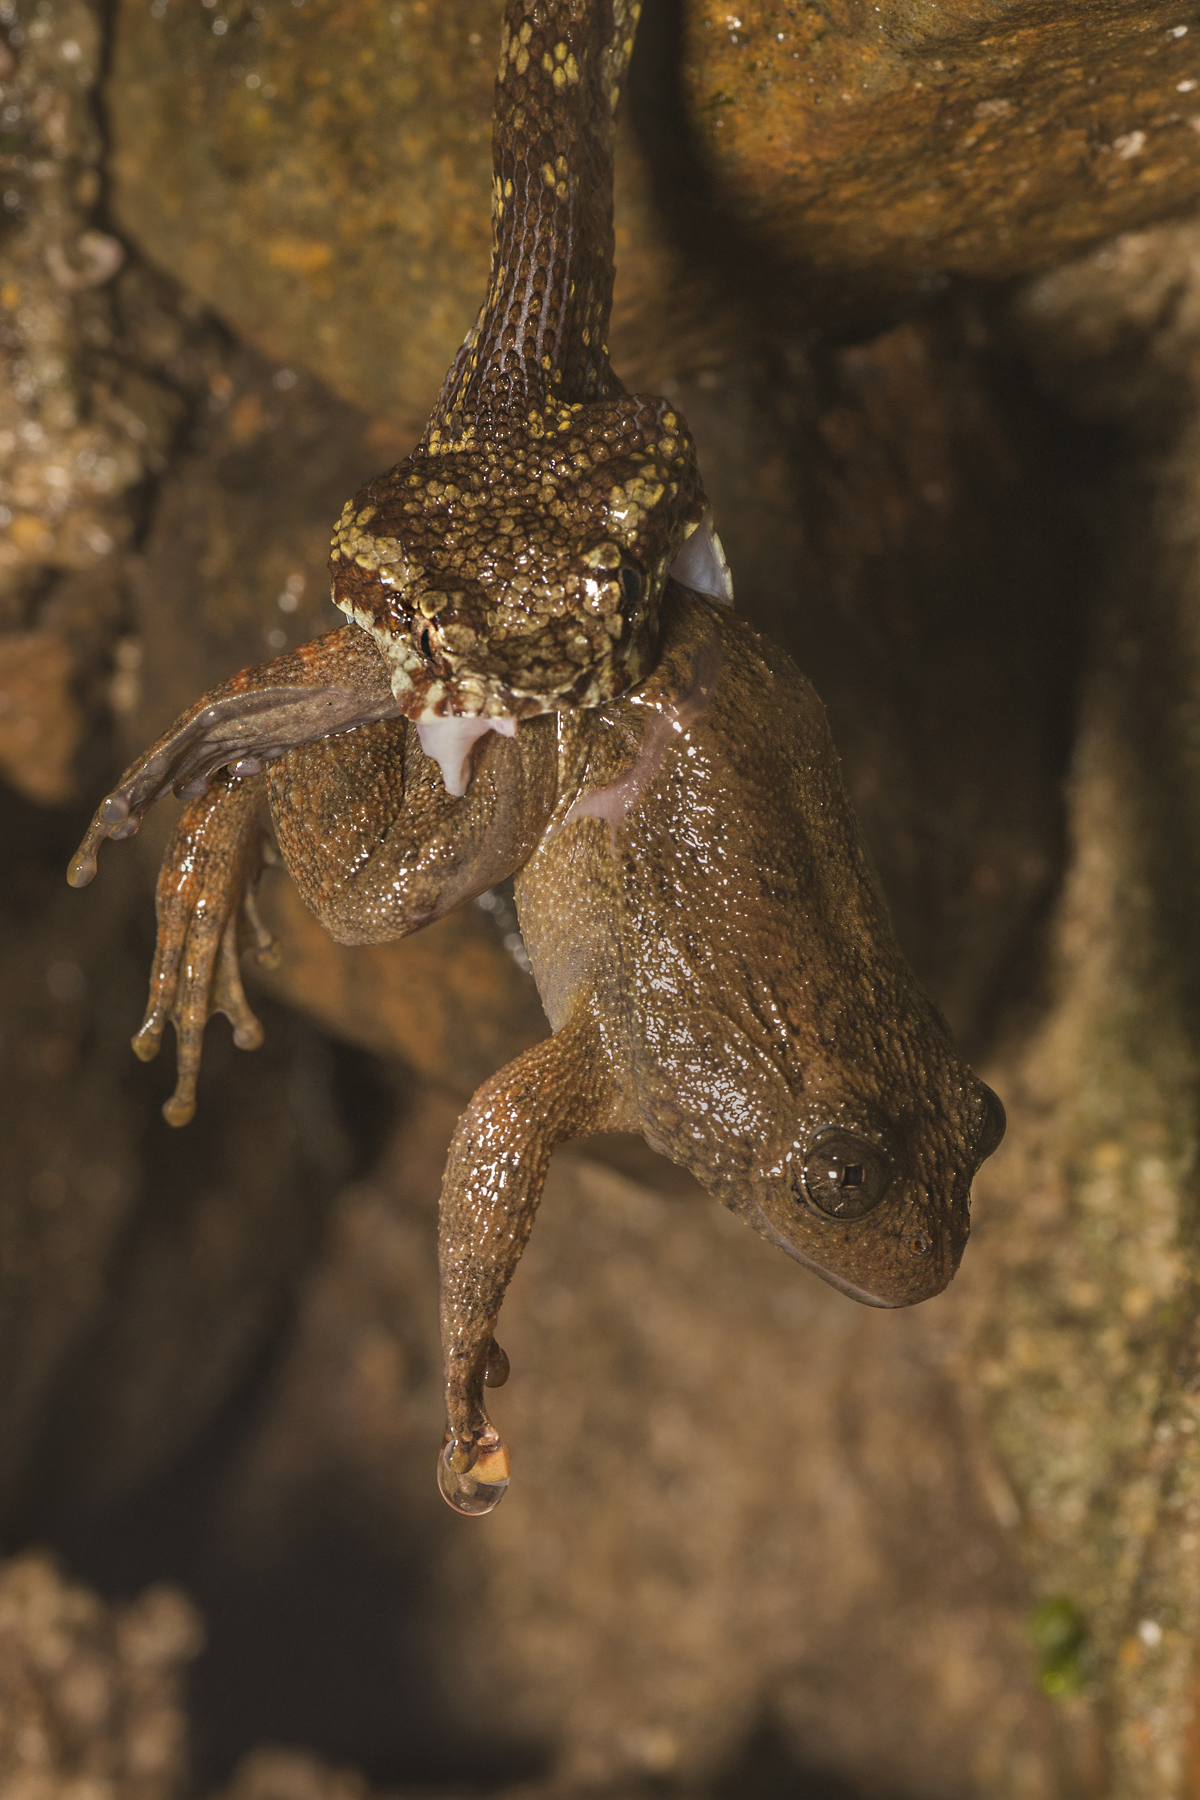 Malabar pit viper Night frog